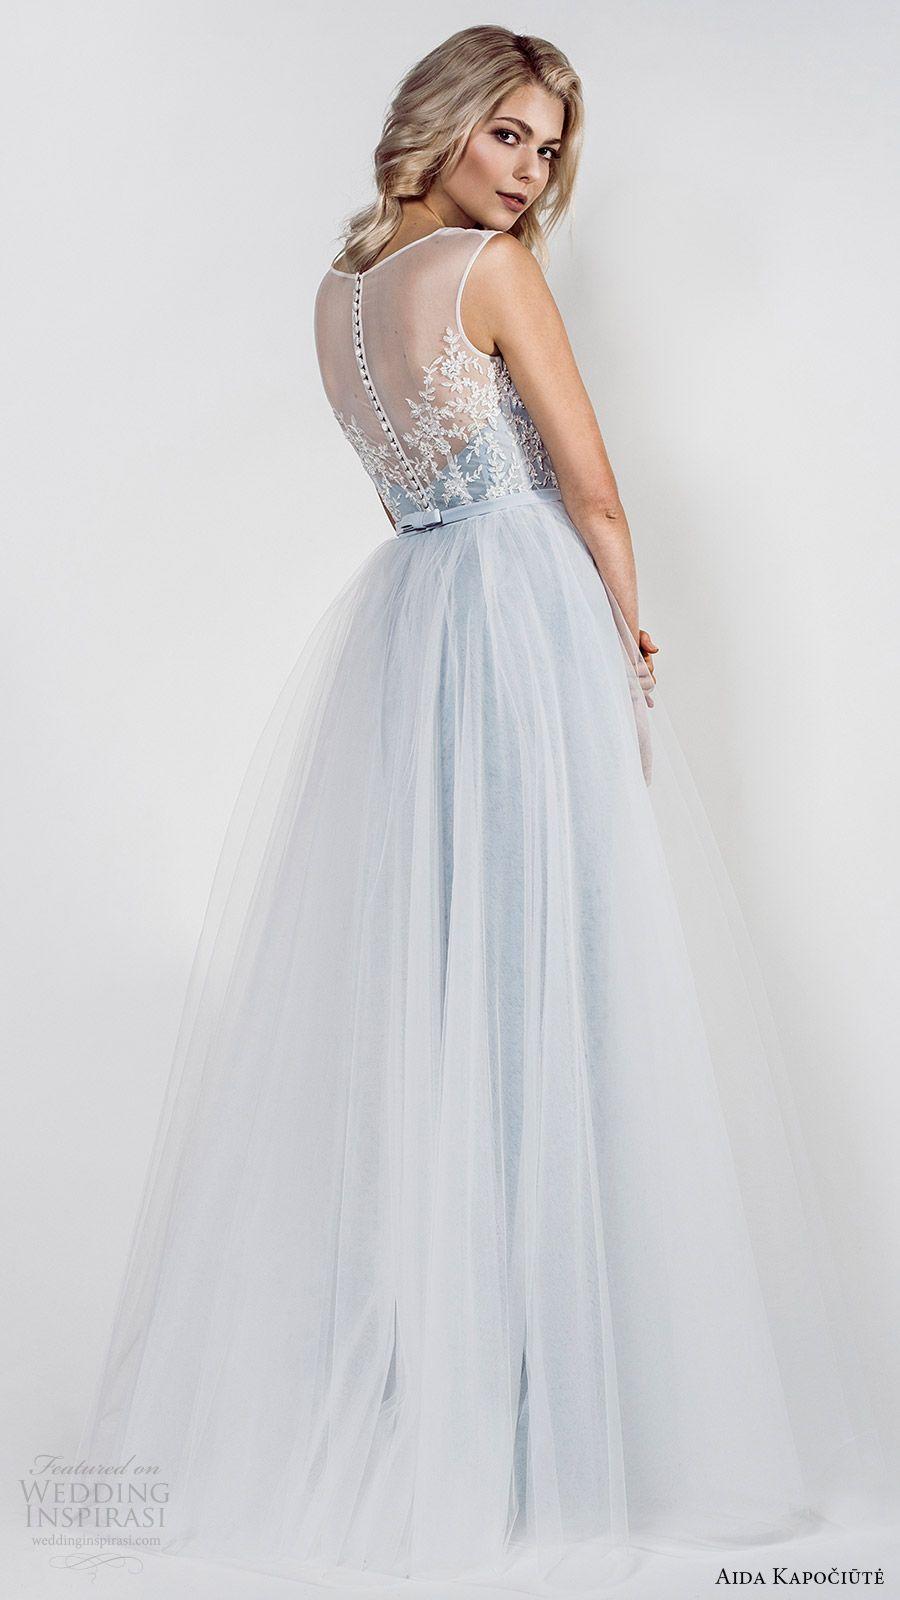 Aida kapociute wedding dresses blue colors illusions and